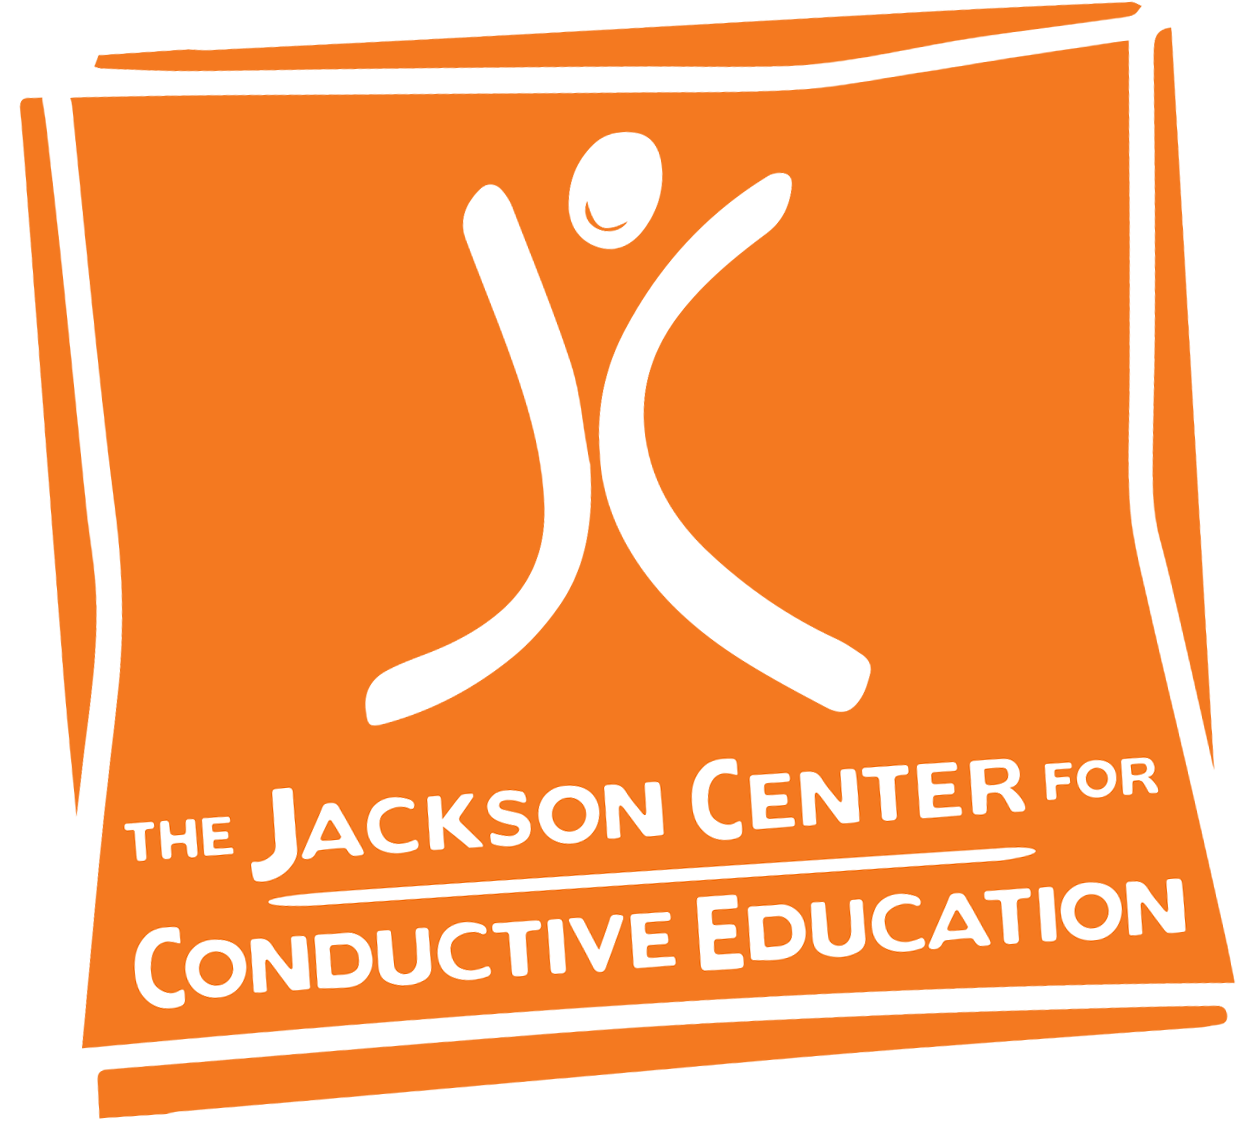 The Jackson Center